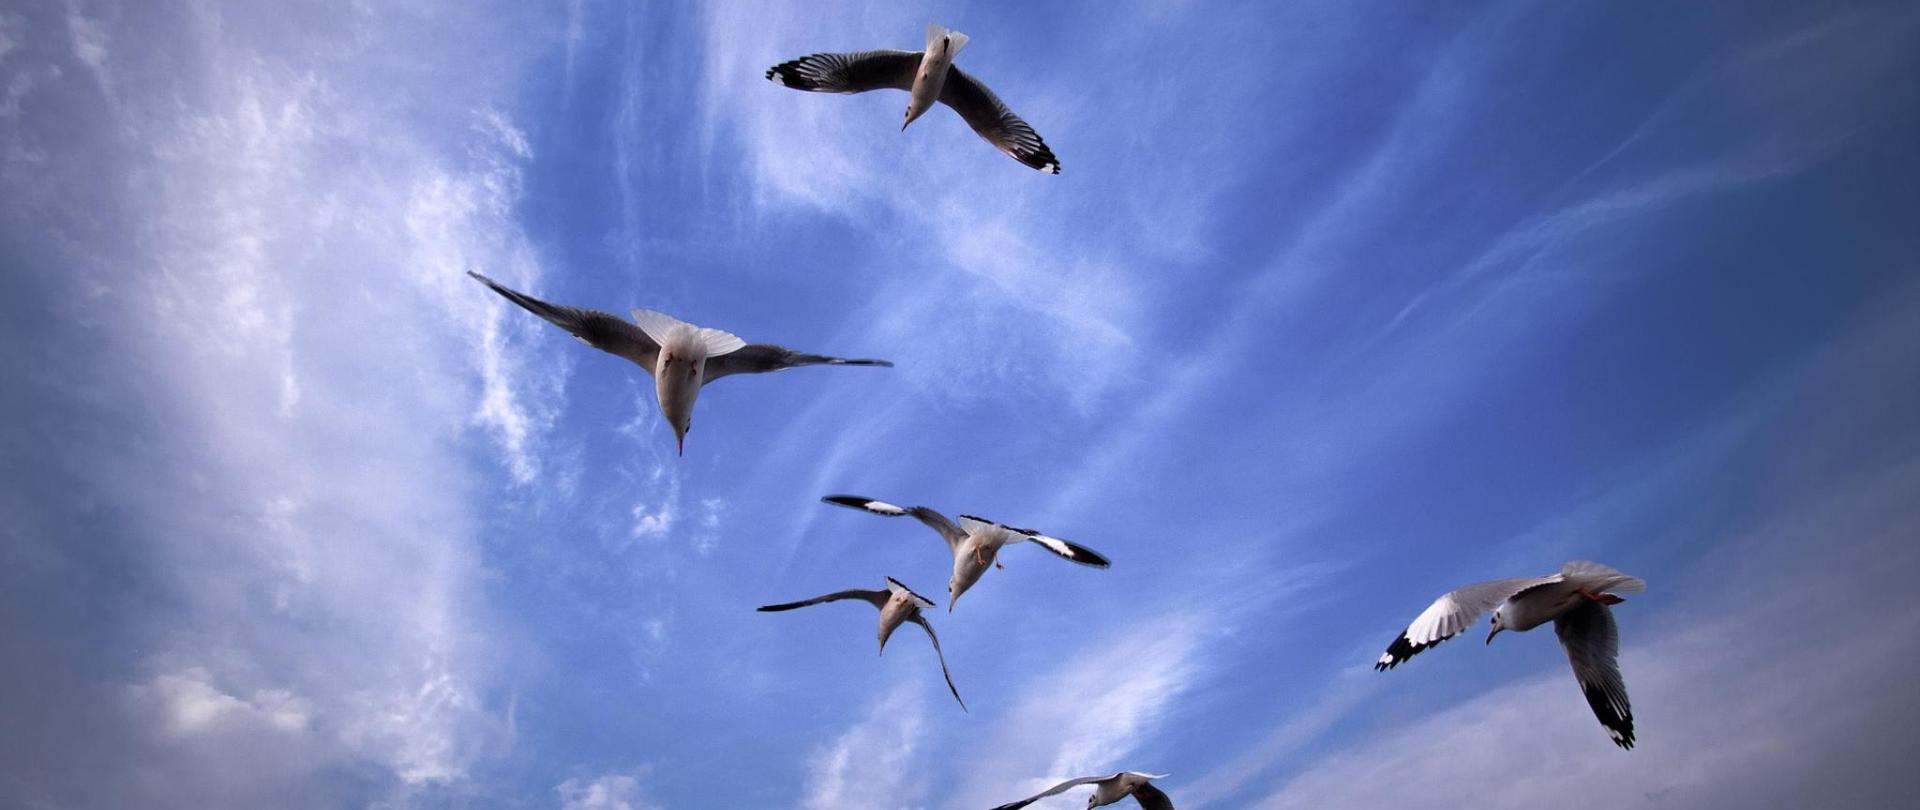 seagull-669907_1920.jpg